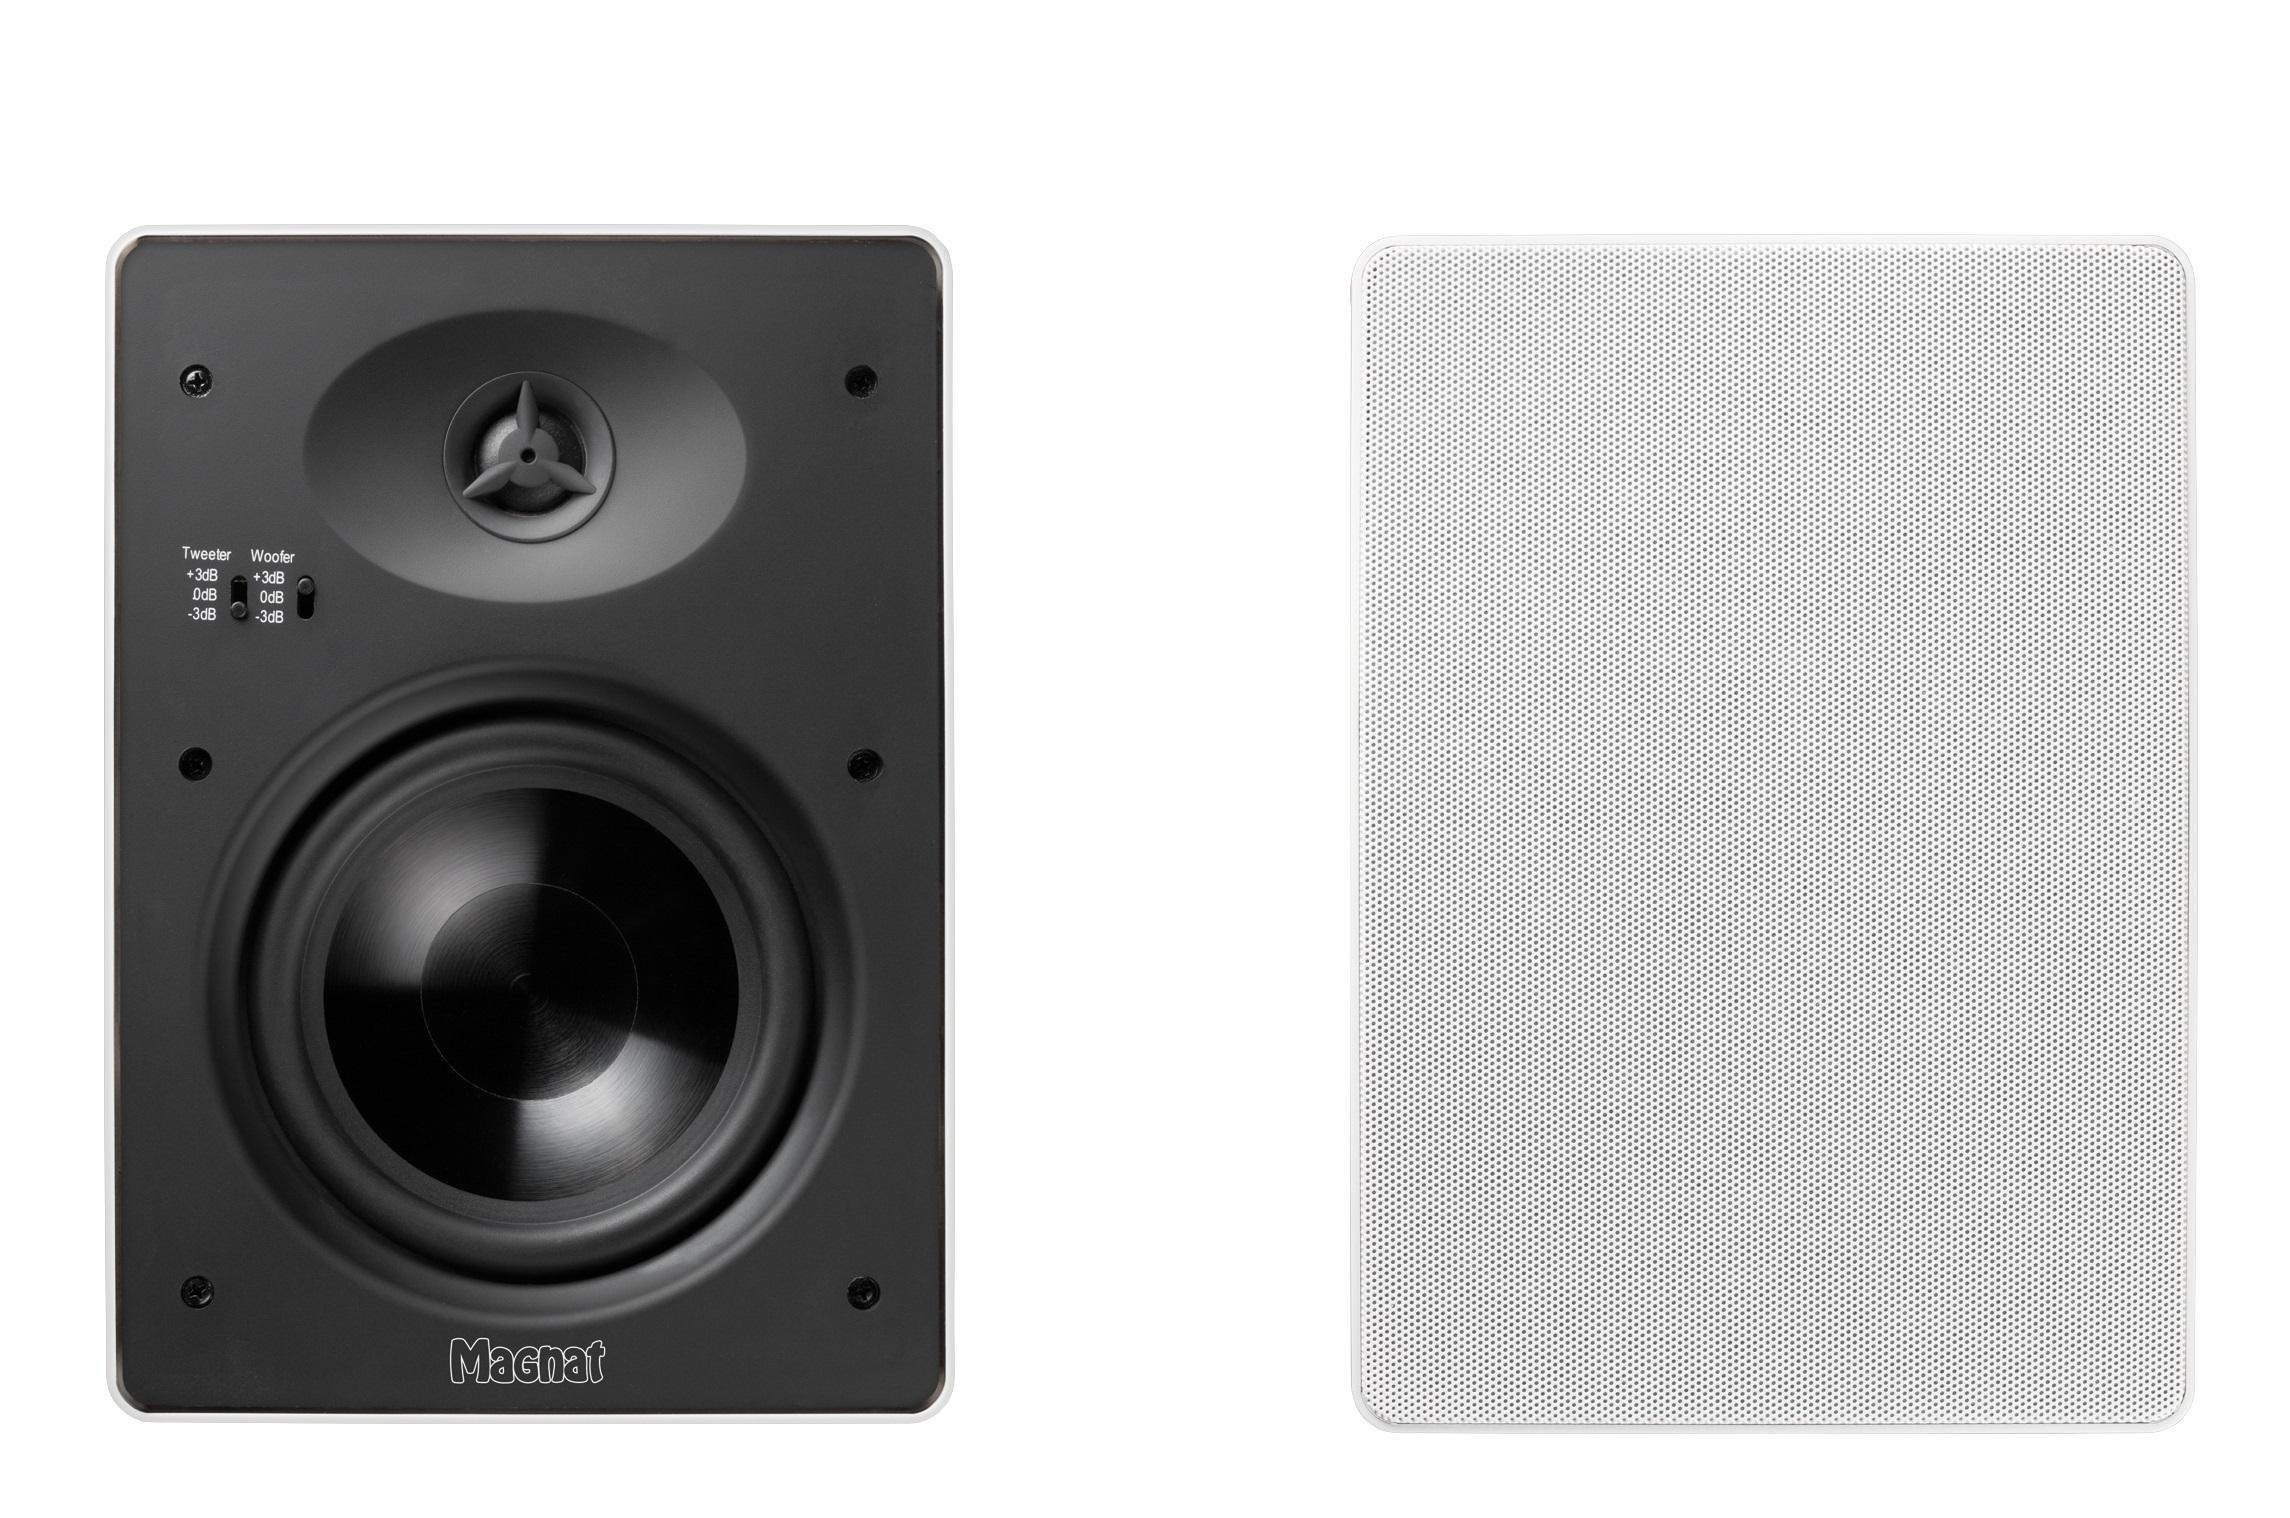 Stereo podtynkowe Magnat IWQ62 100W -sklep Lubin